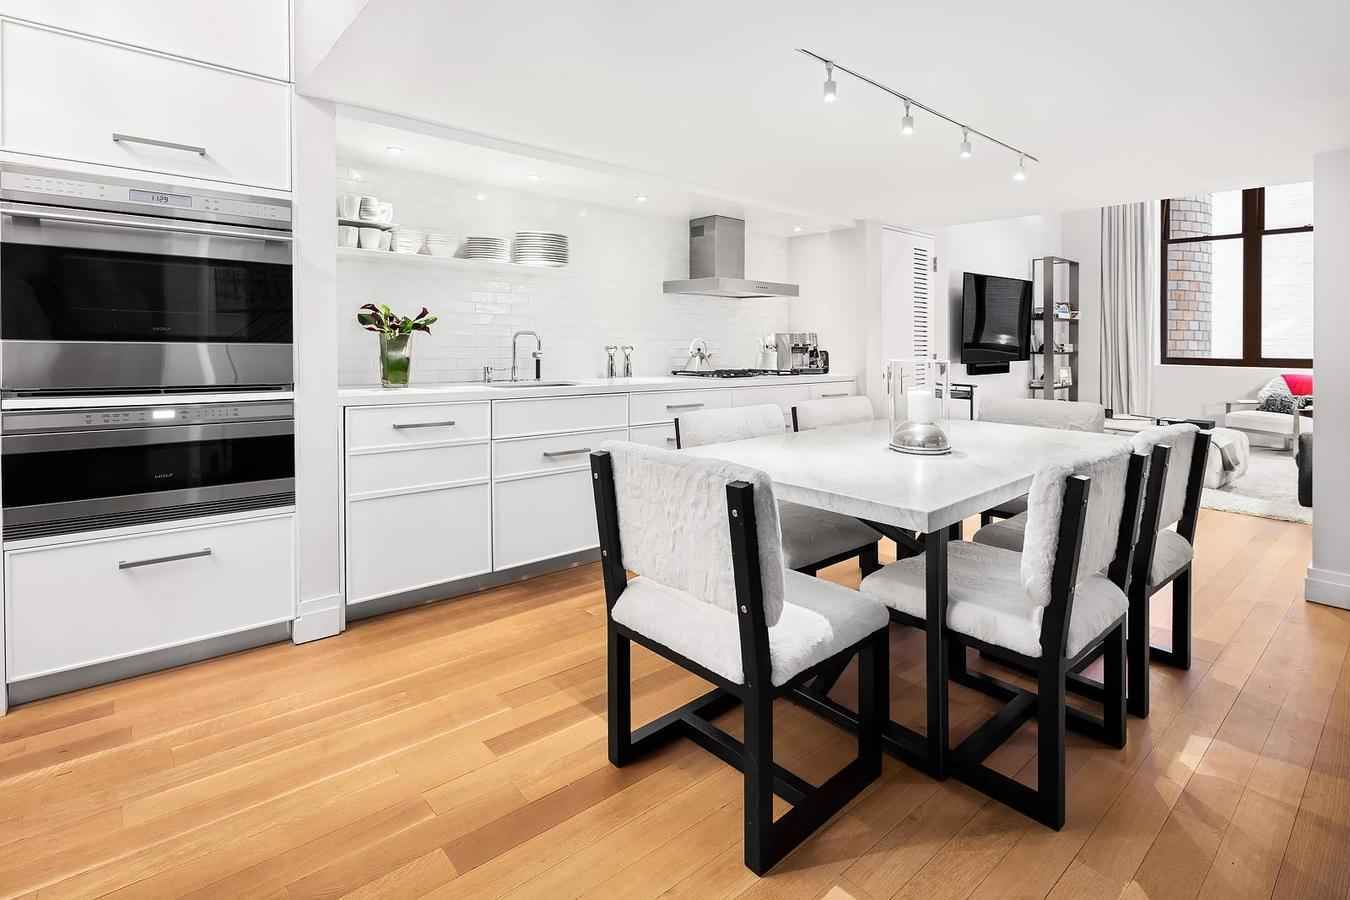 Apartment for sale at 421 Hudson Street, Apt 321